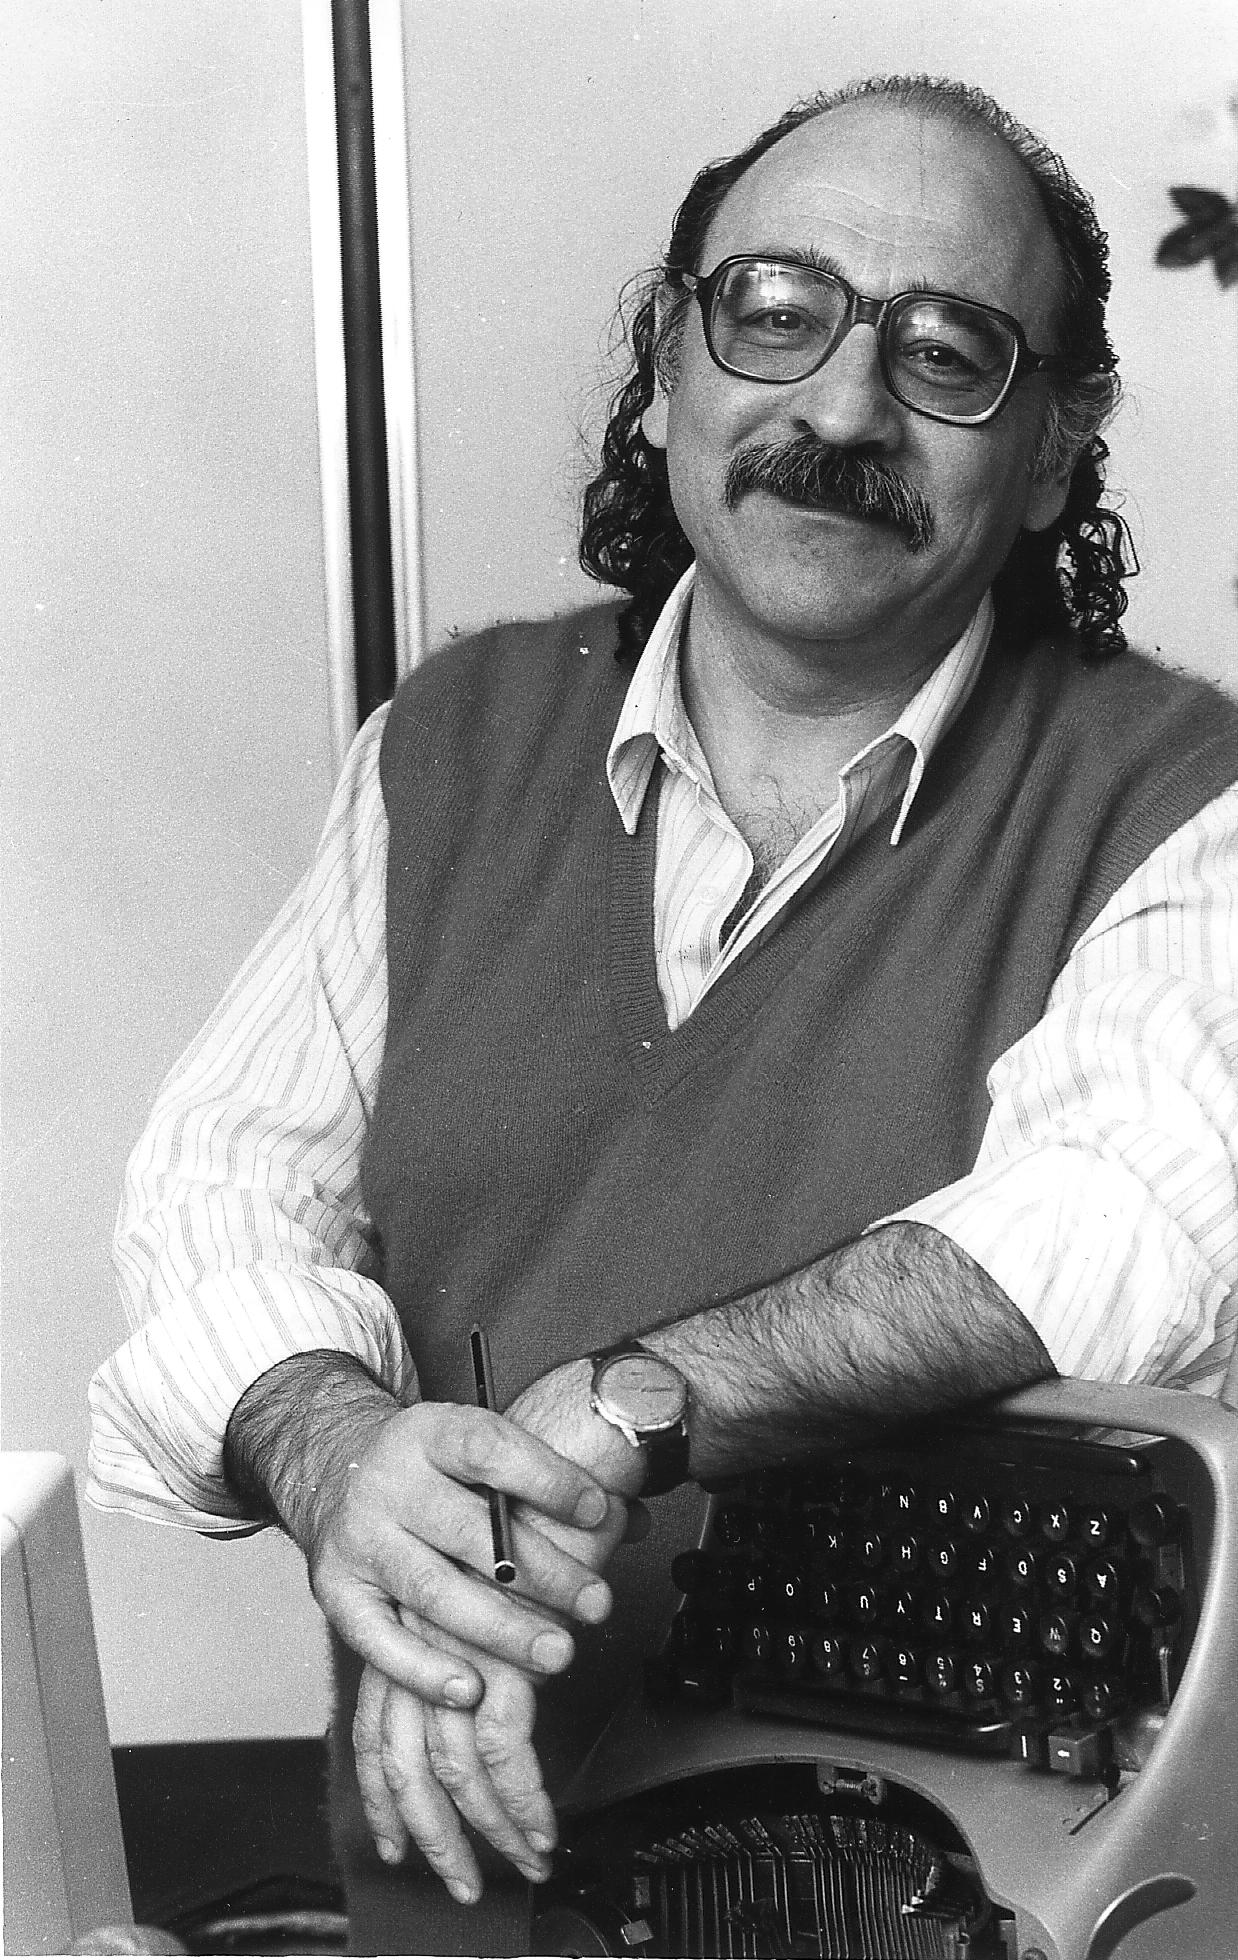 Rodolfo Braceli